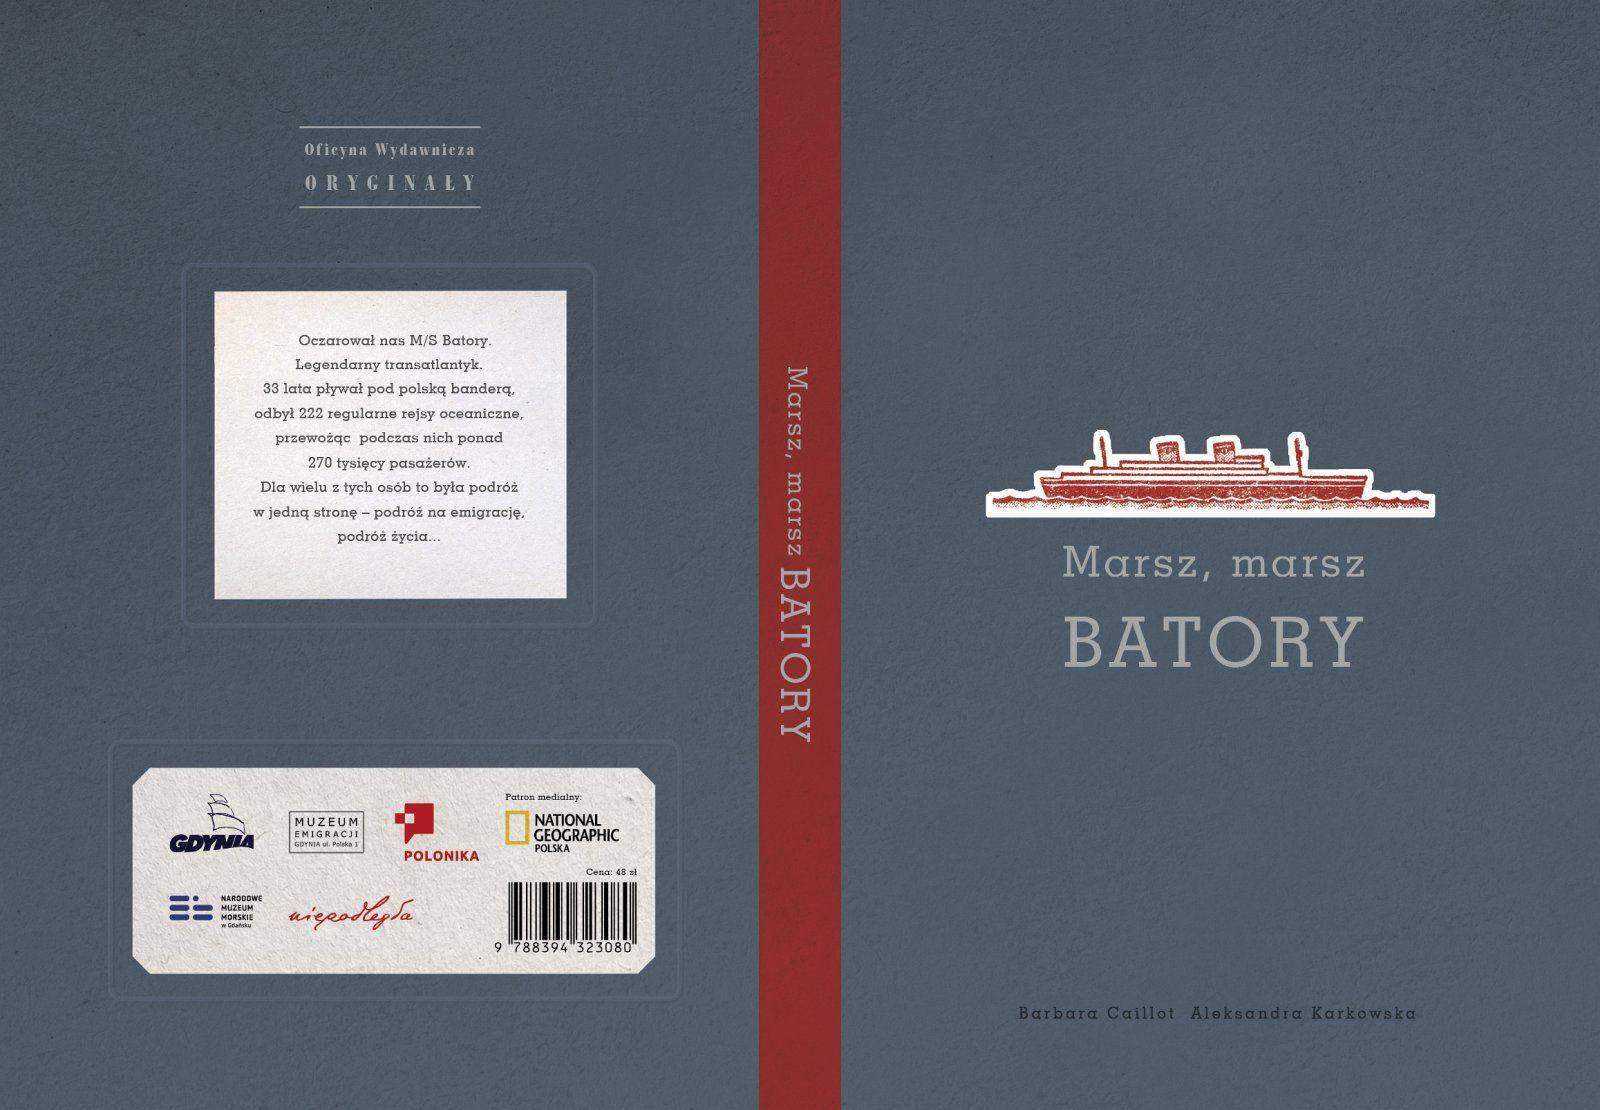 oficyna-oryginaly_marszmarsz-batory-okladkacala-www